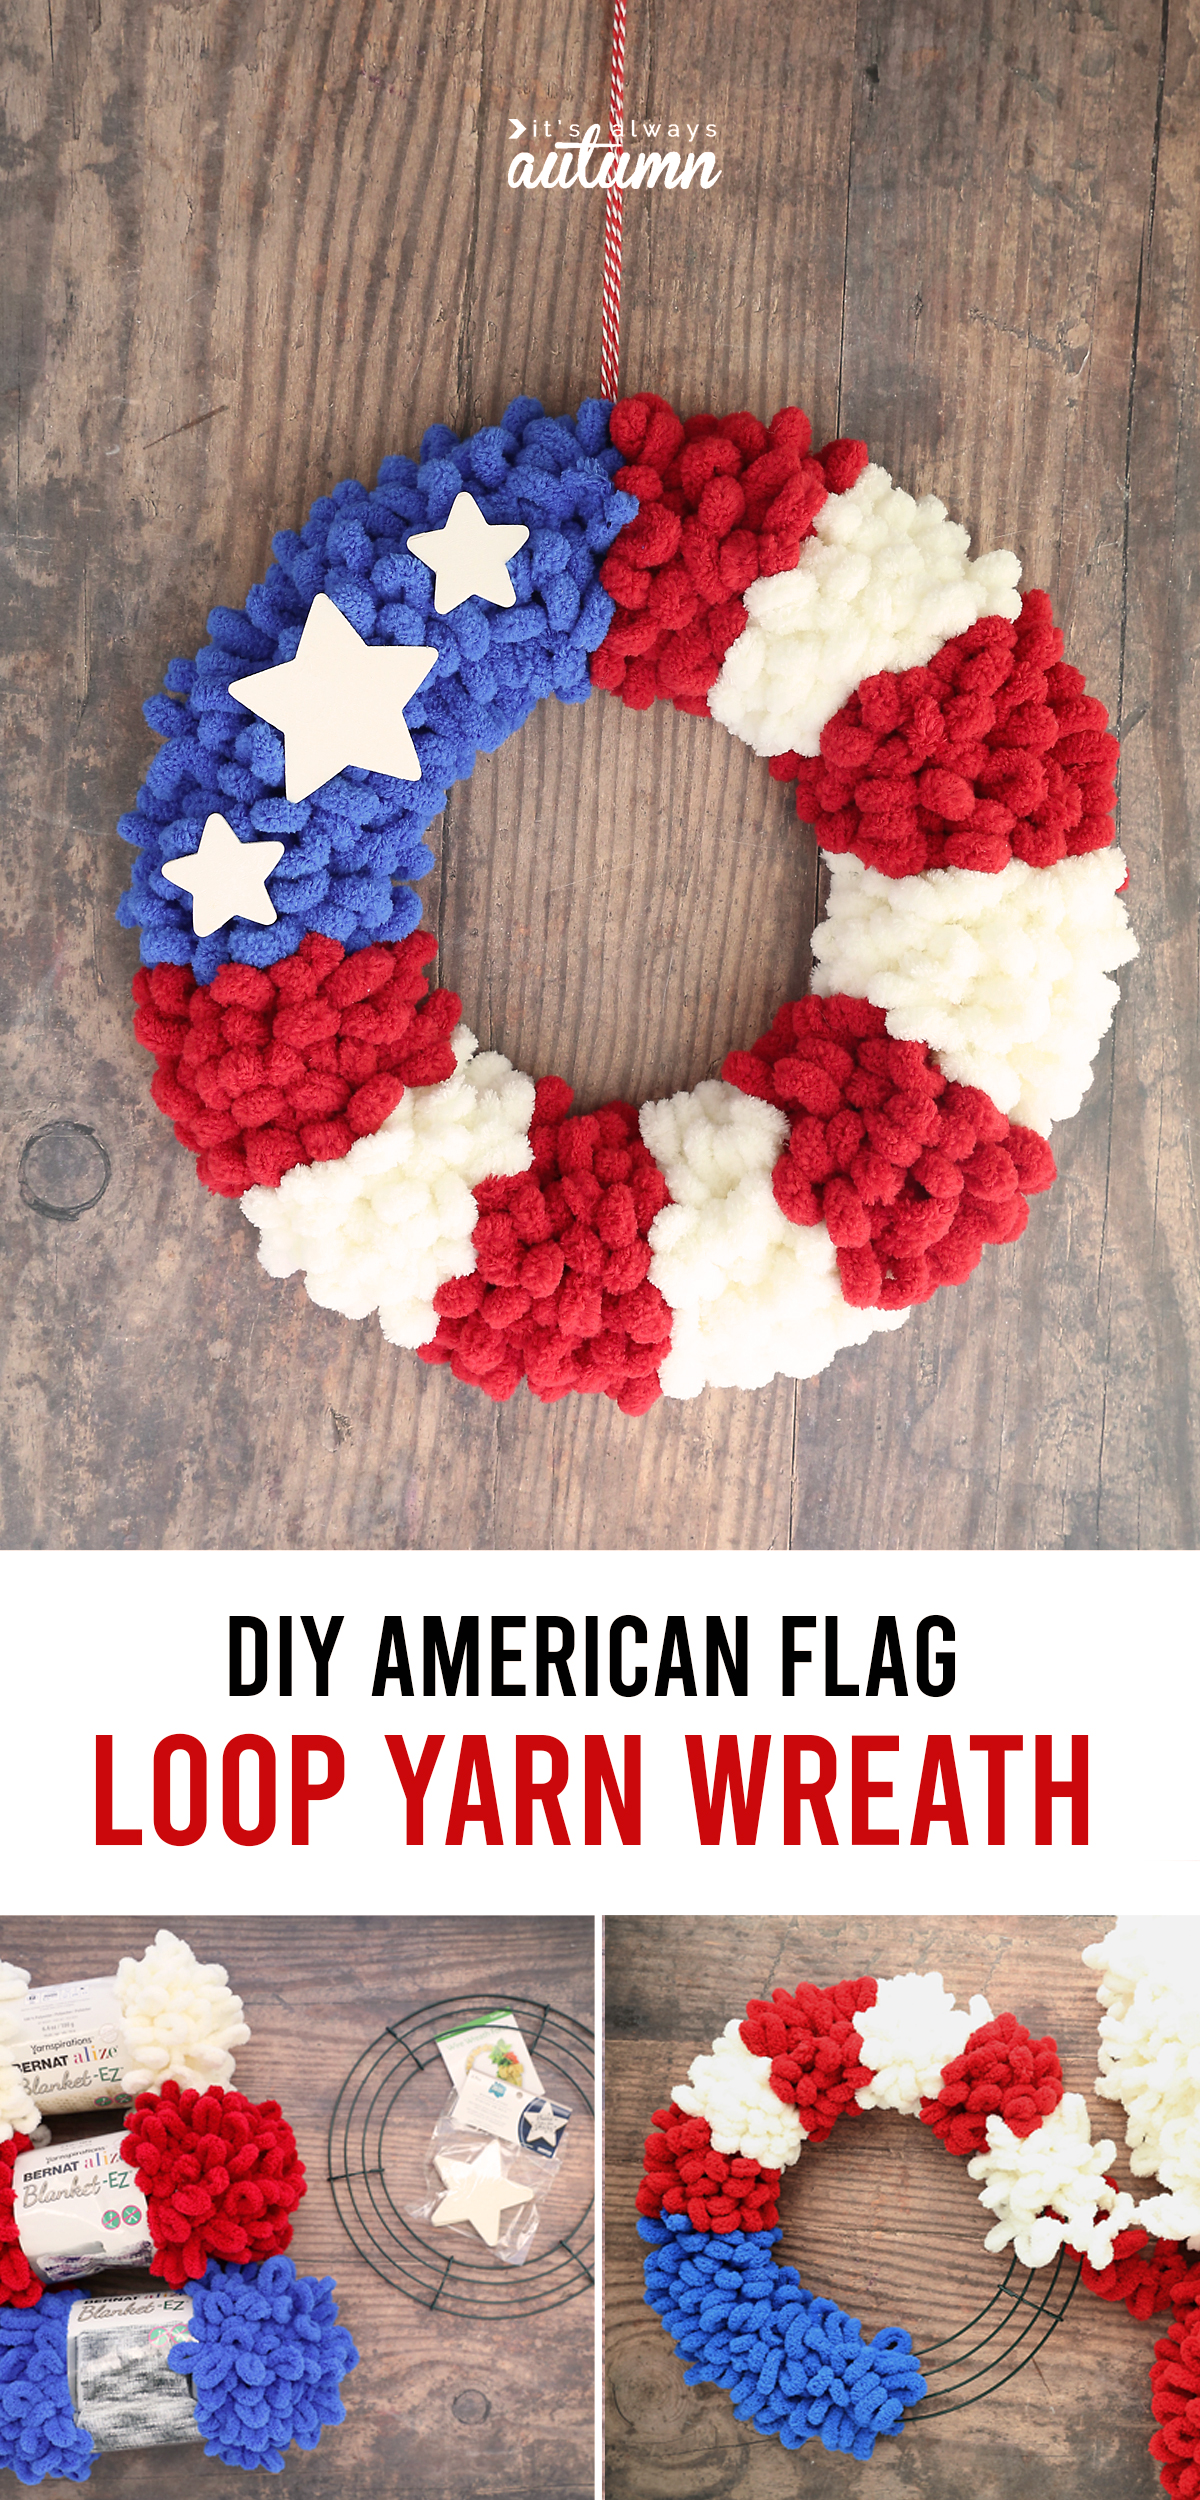 DIY American Flag loop yarn wreath; red, white, and blue loop yarn and wire wreath form